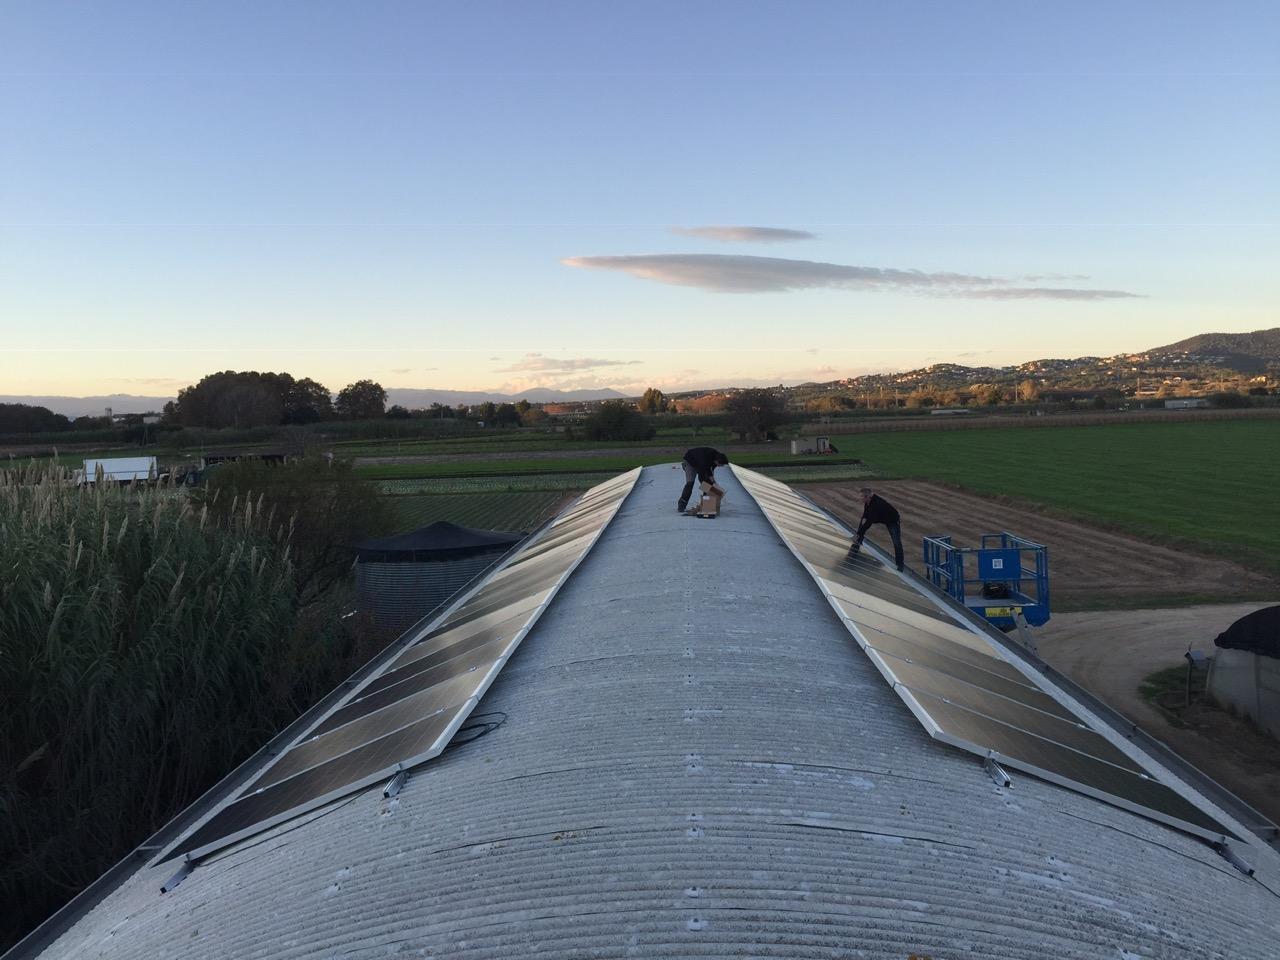 Instal·lació agrícola – 14 kWp